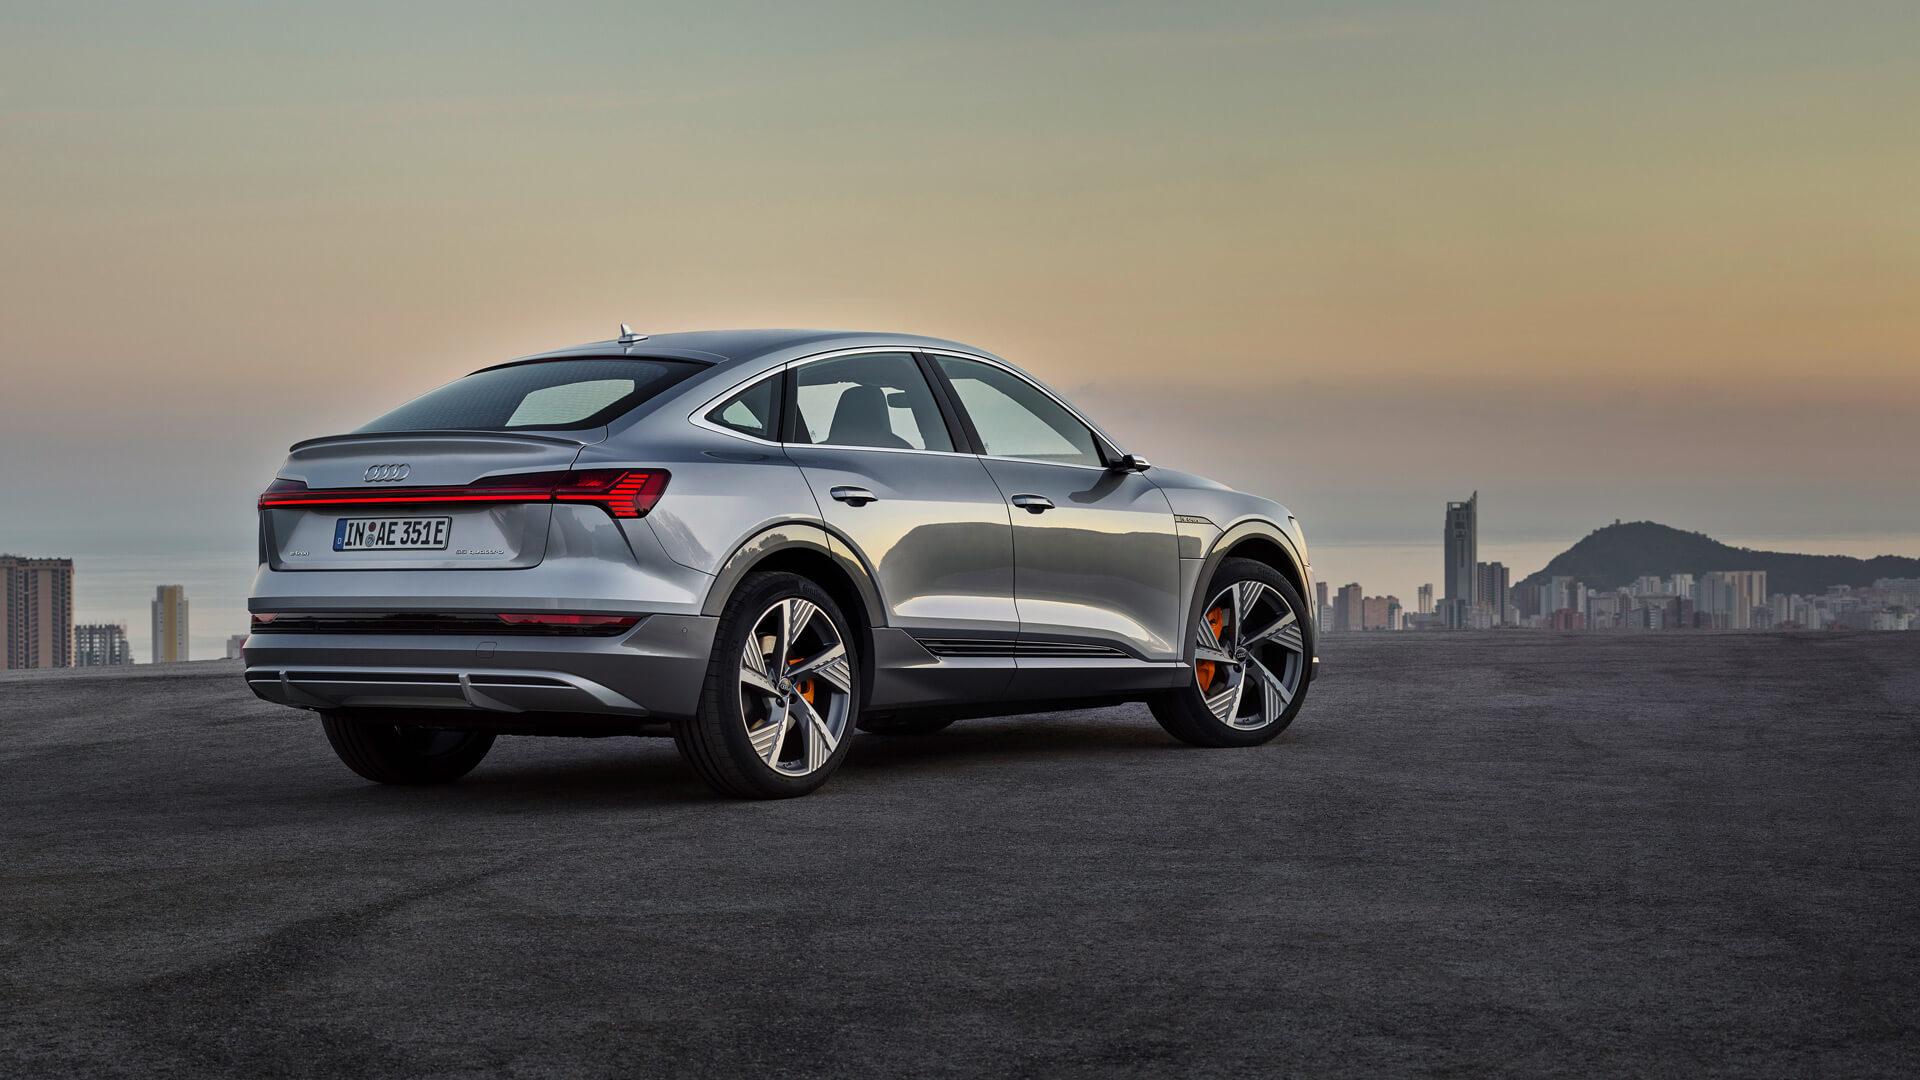 Фотография экоавто Audi e-tron Sportback 55 quattro - фото 5